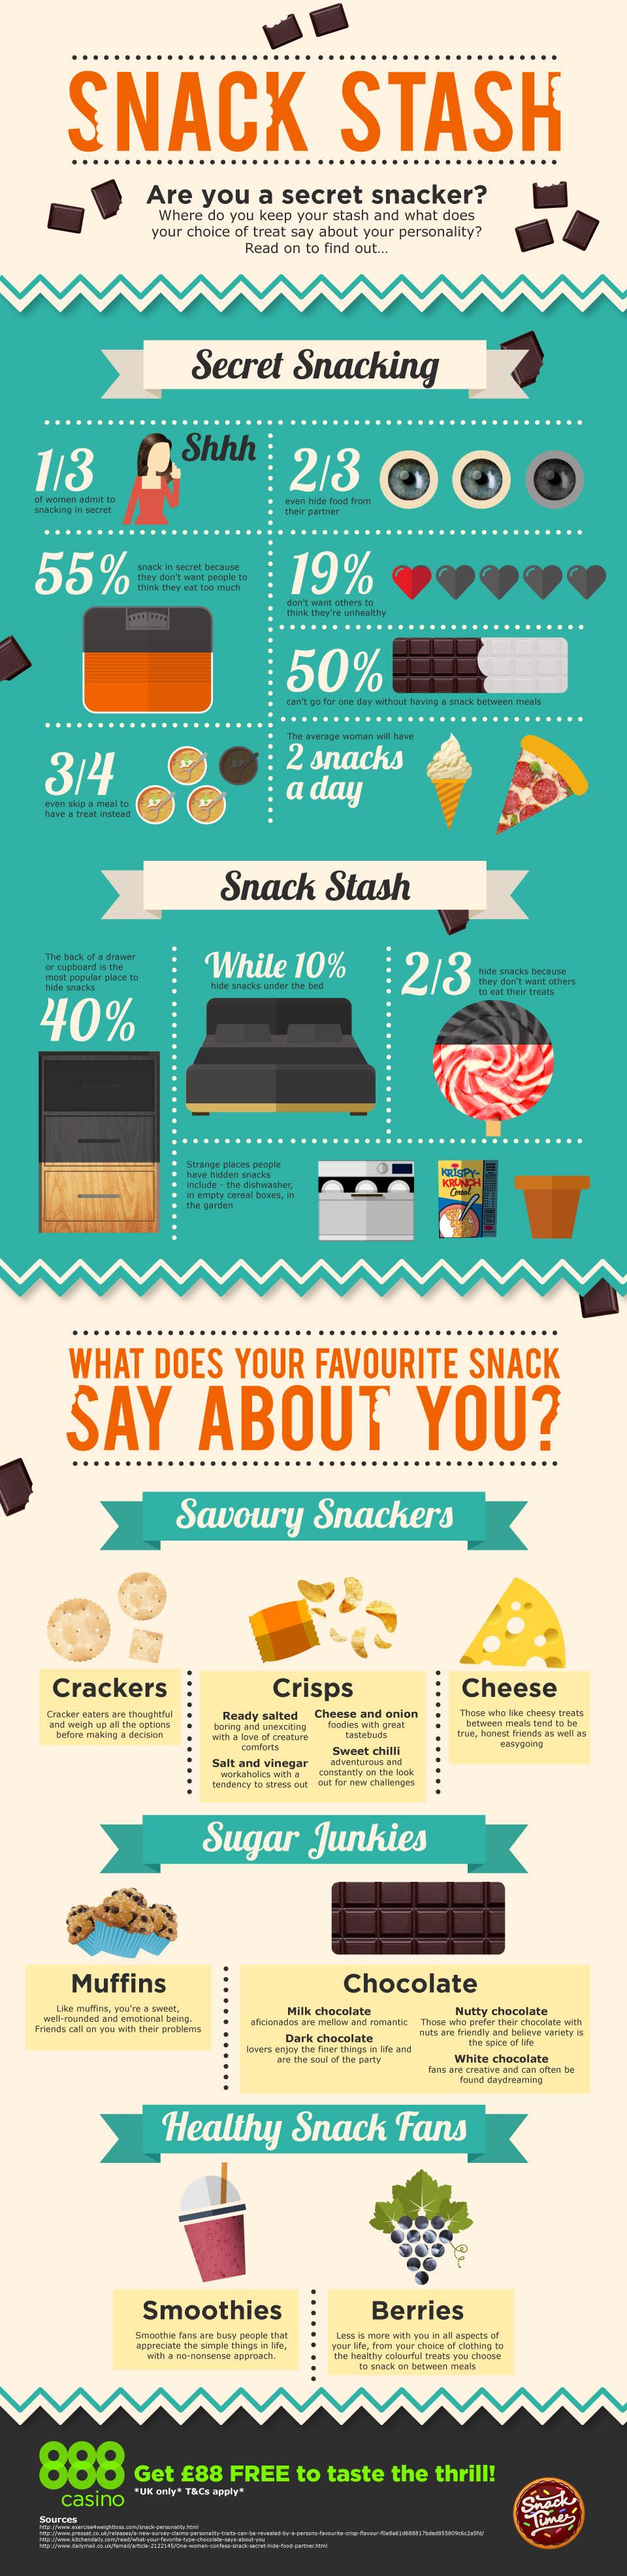 Infographic: Snack Stash